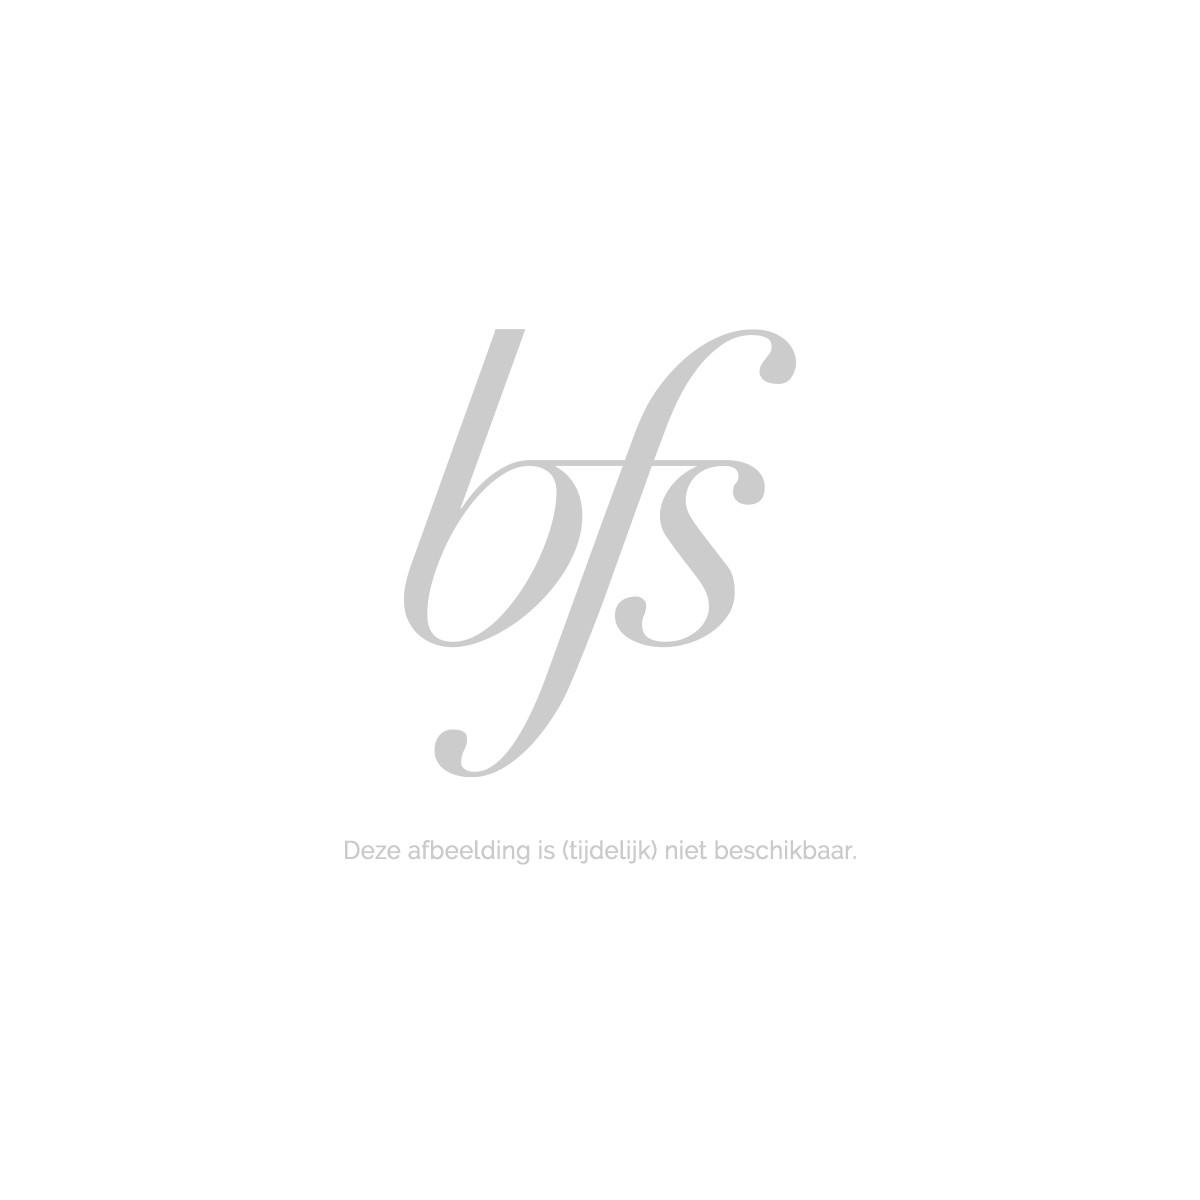 Afbeelding van Dermalogica Clear Start Blackhead Fizz Masque 50Ml Jonge huid Acne & Puistjes Beauty